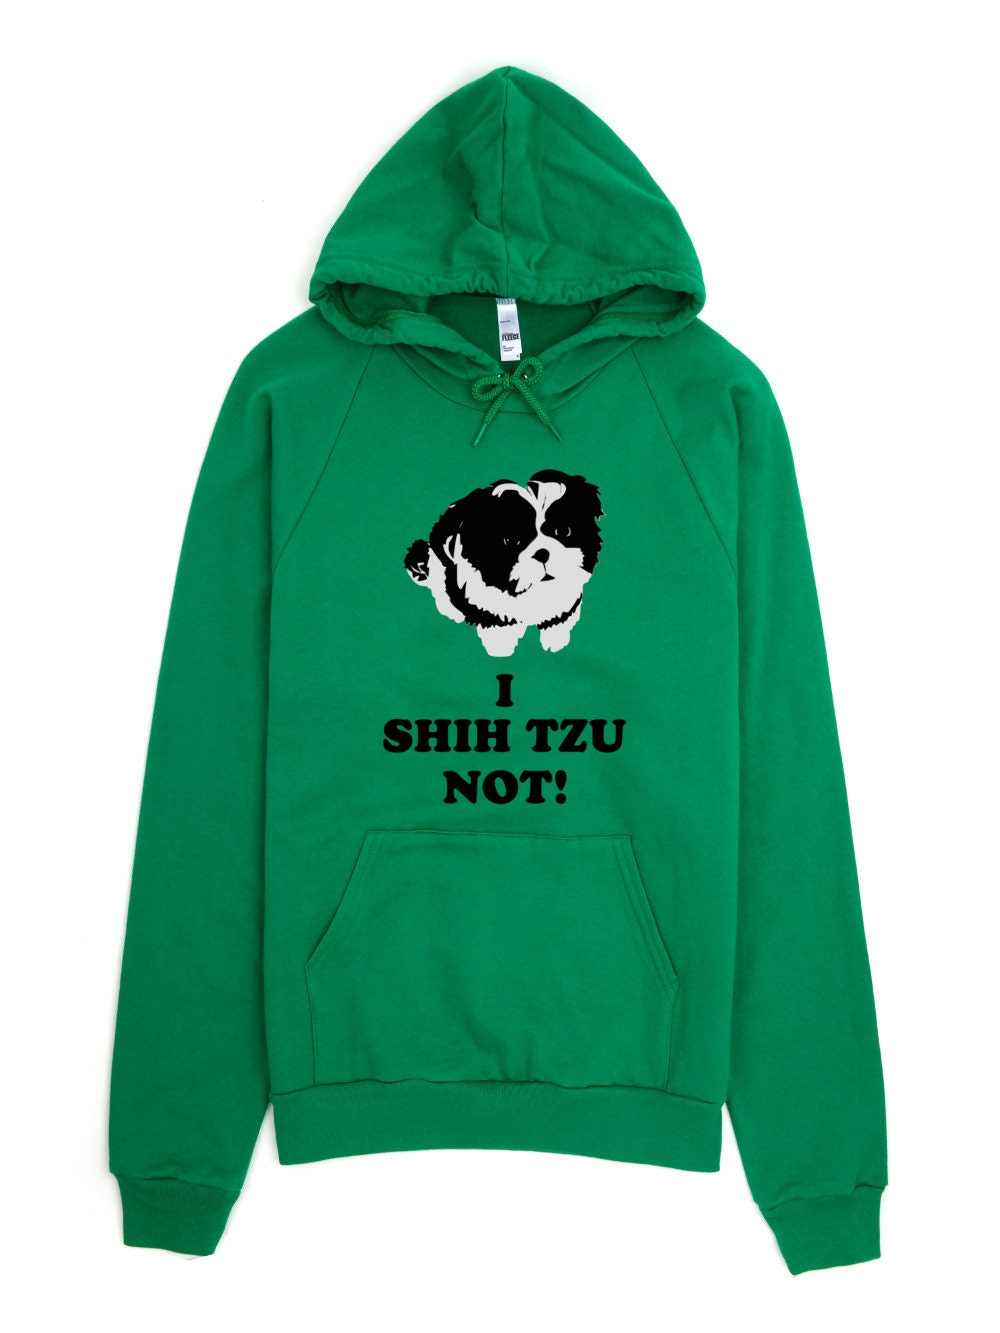 Only Shih Tzus - I Shih Tzu Not Hoodie